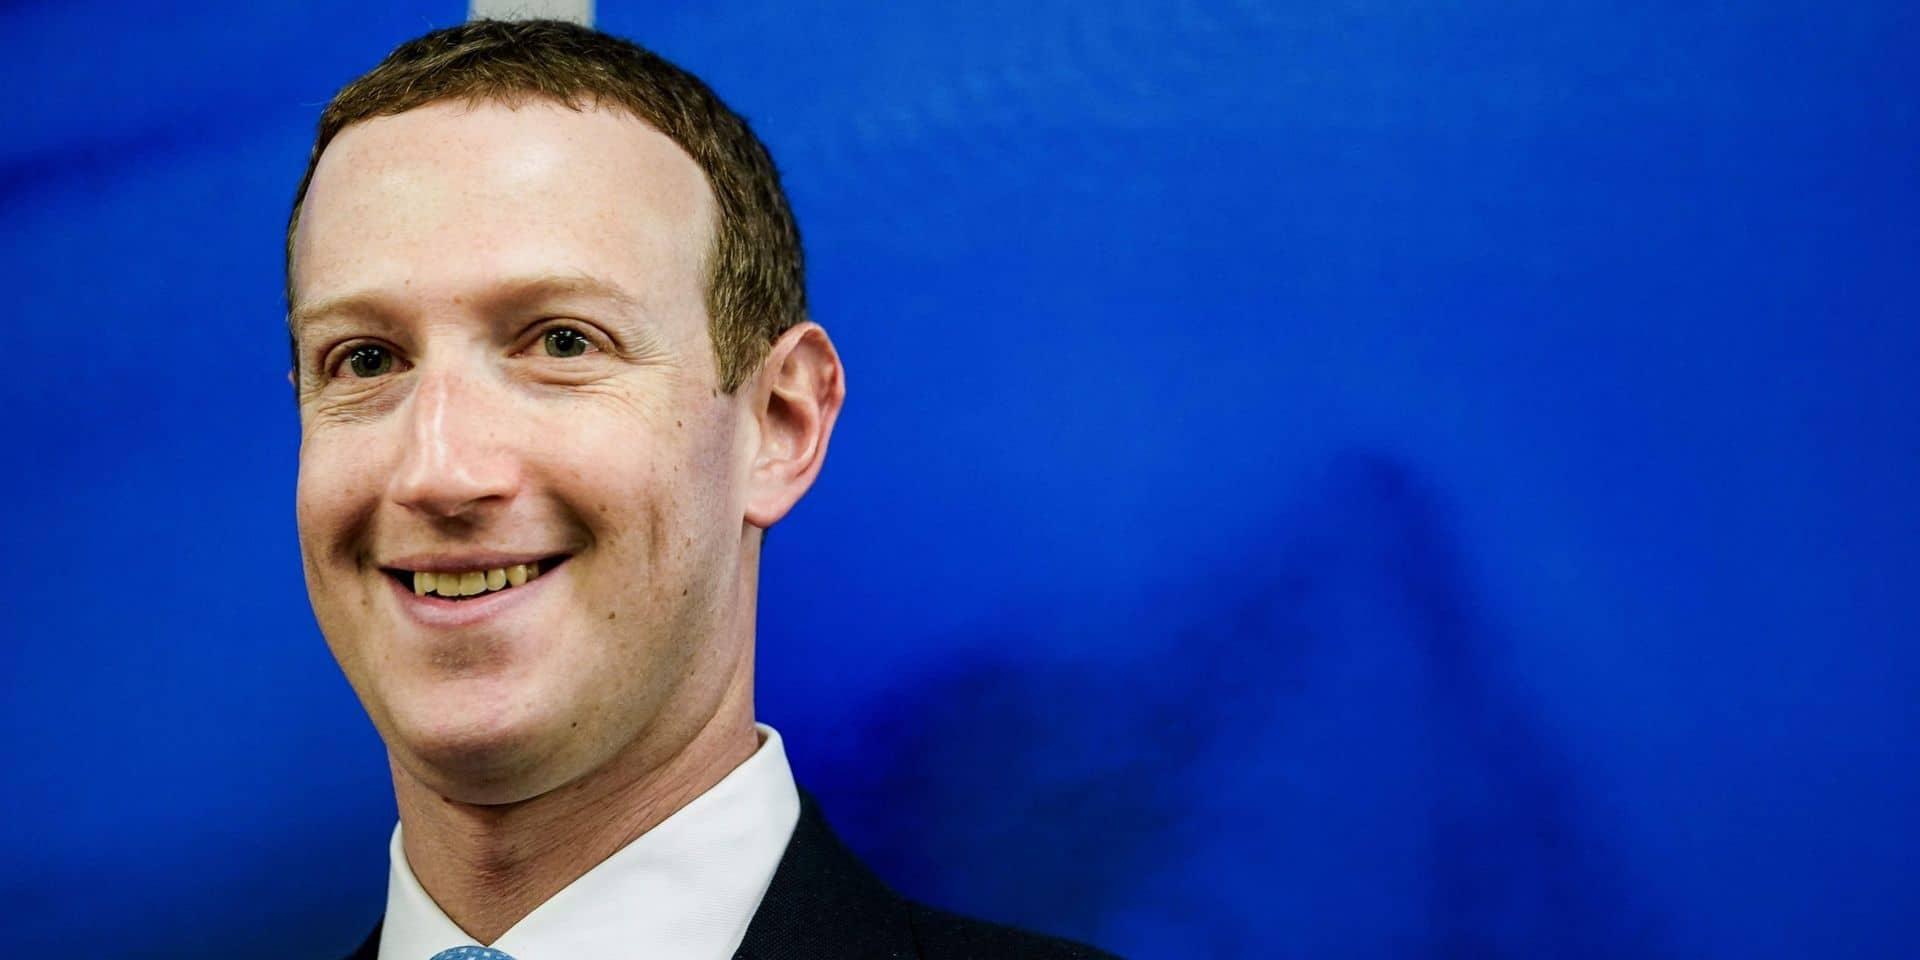 Mark Zuckerberg surpris dans un bar bruxellois: des touristes partagent des photos du patron de Facebook